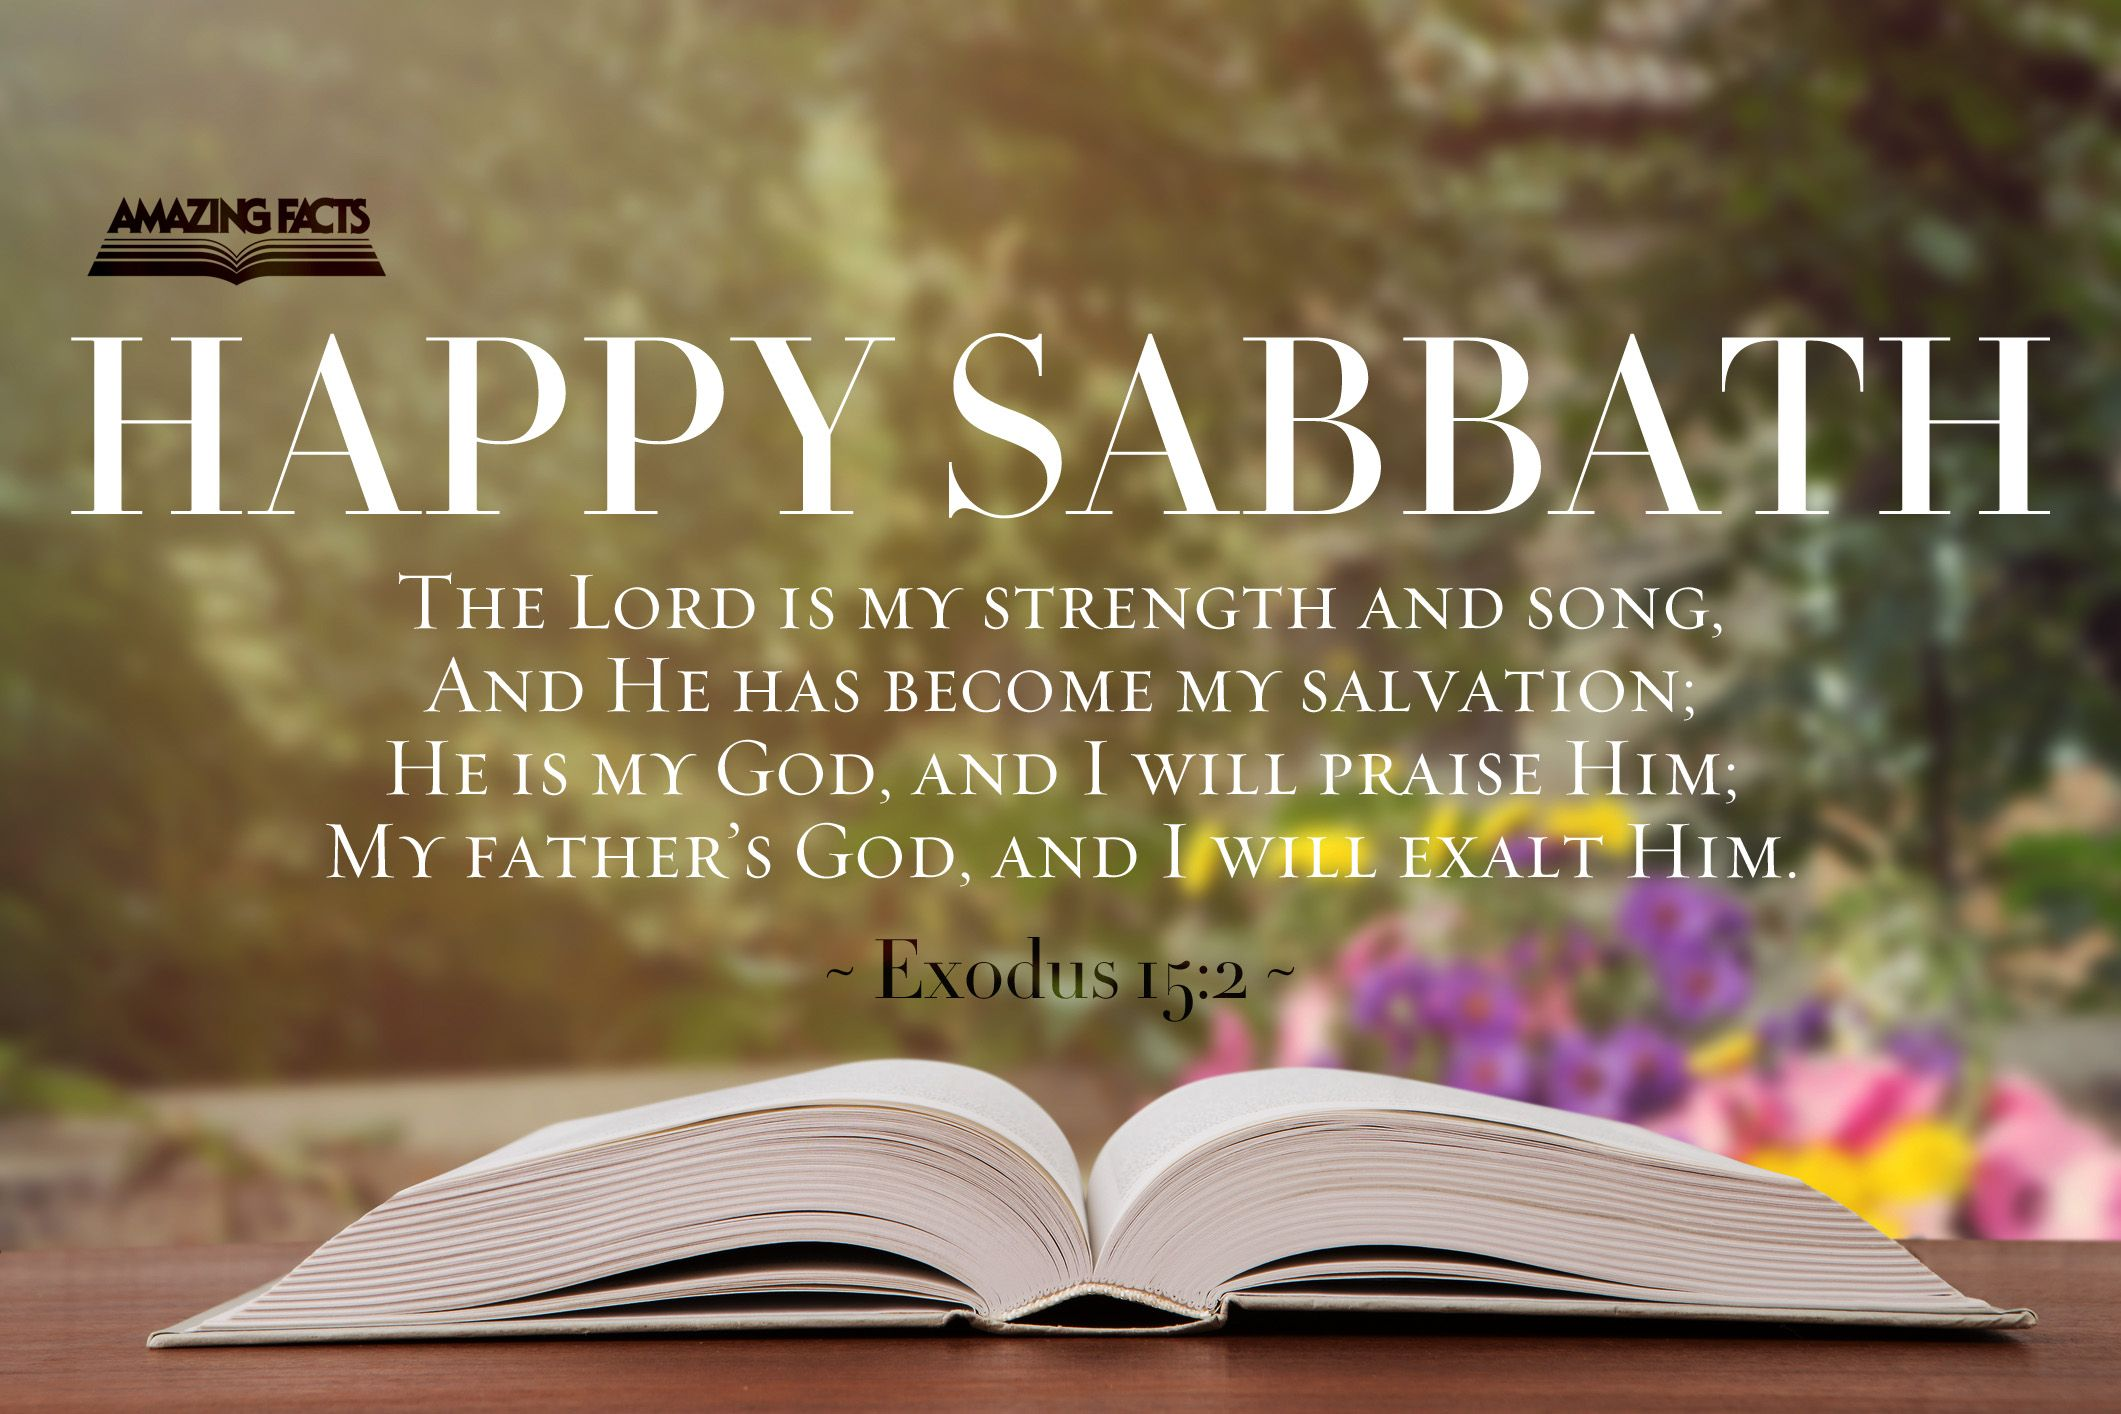 Happy sabbath happy sabbath happy sabbath quotes